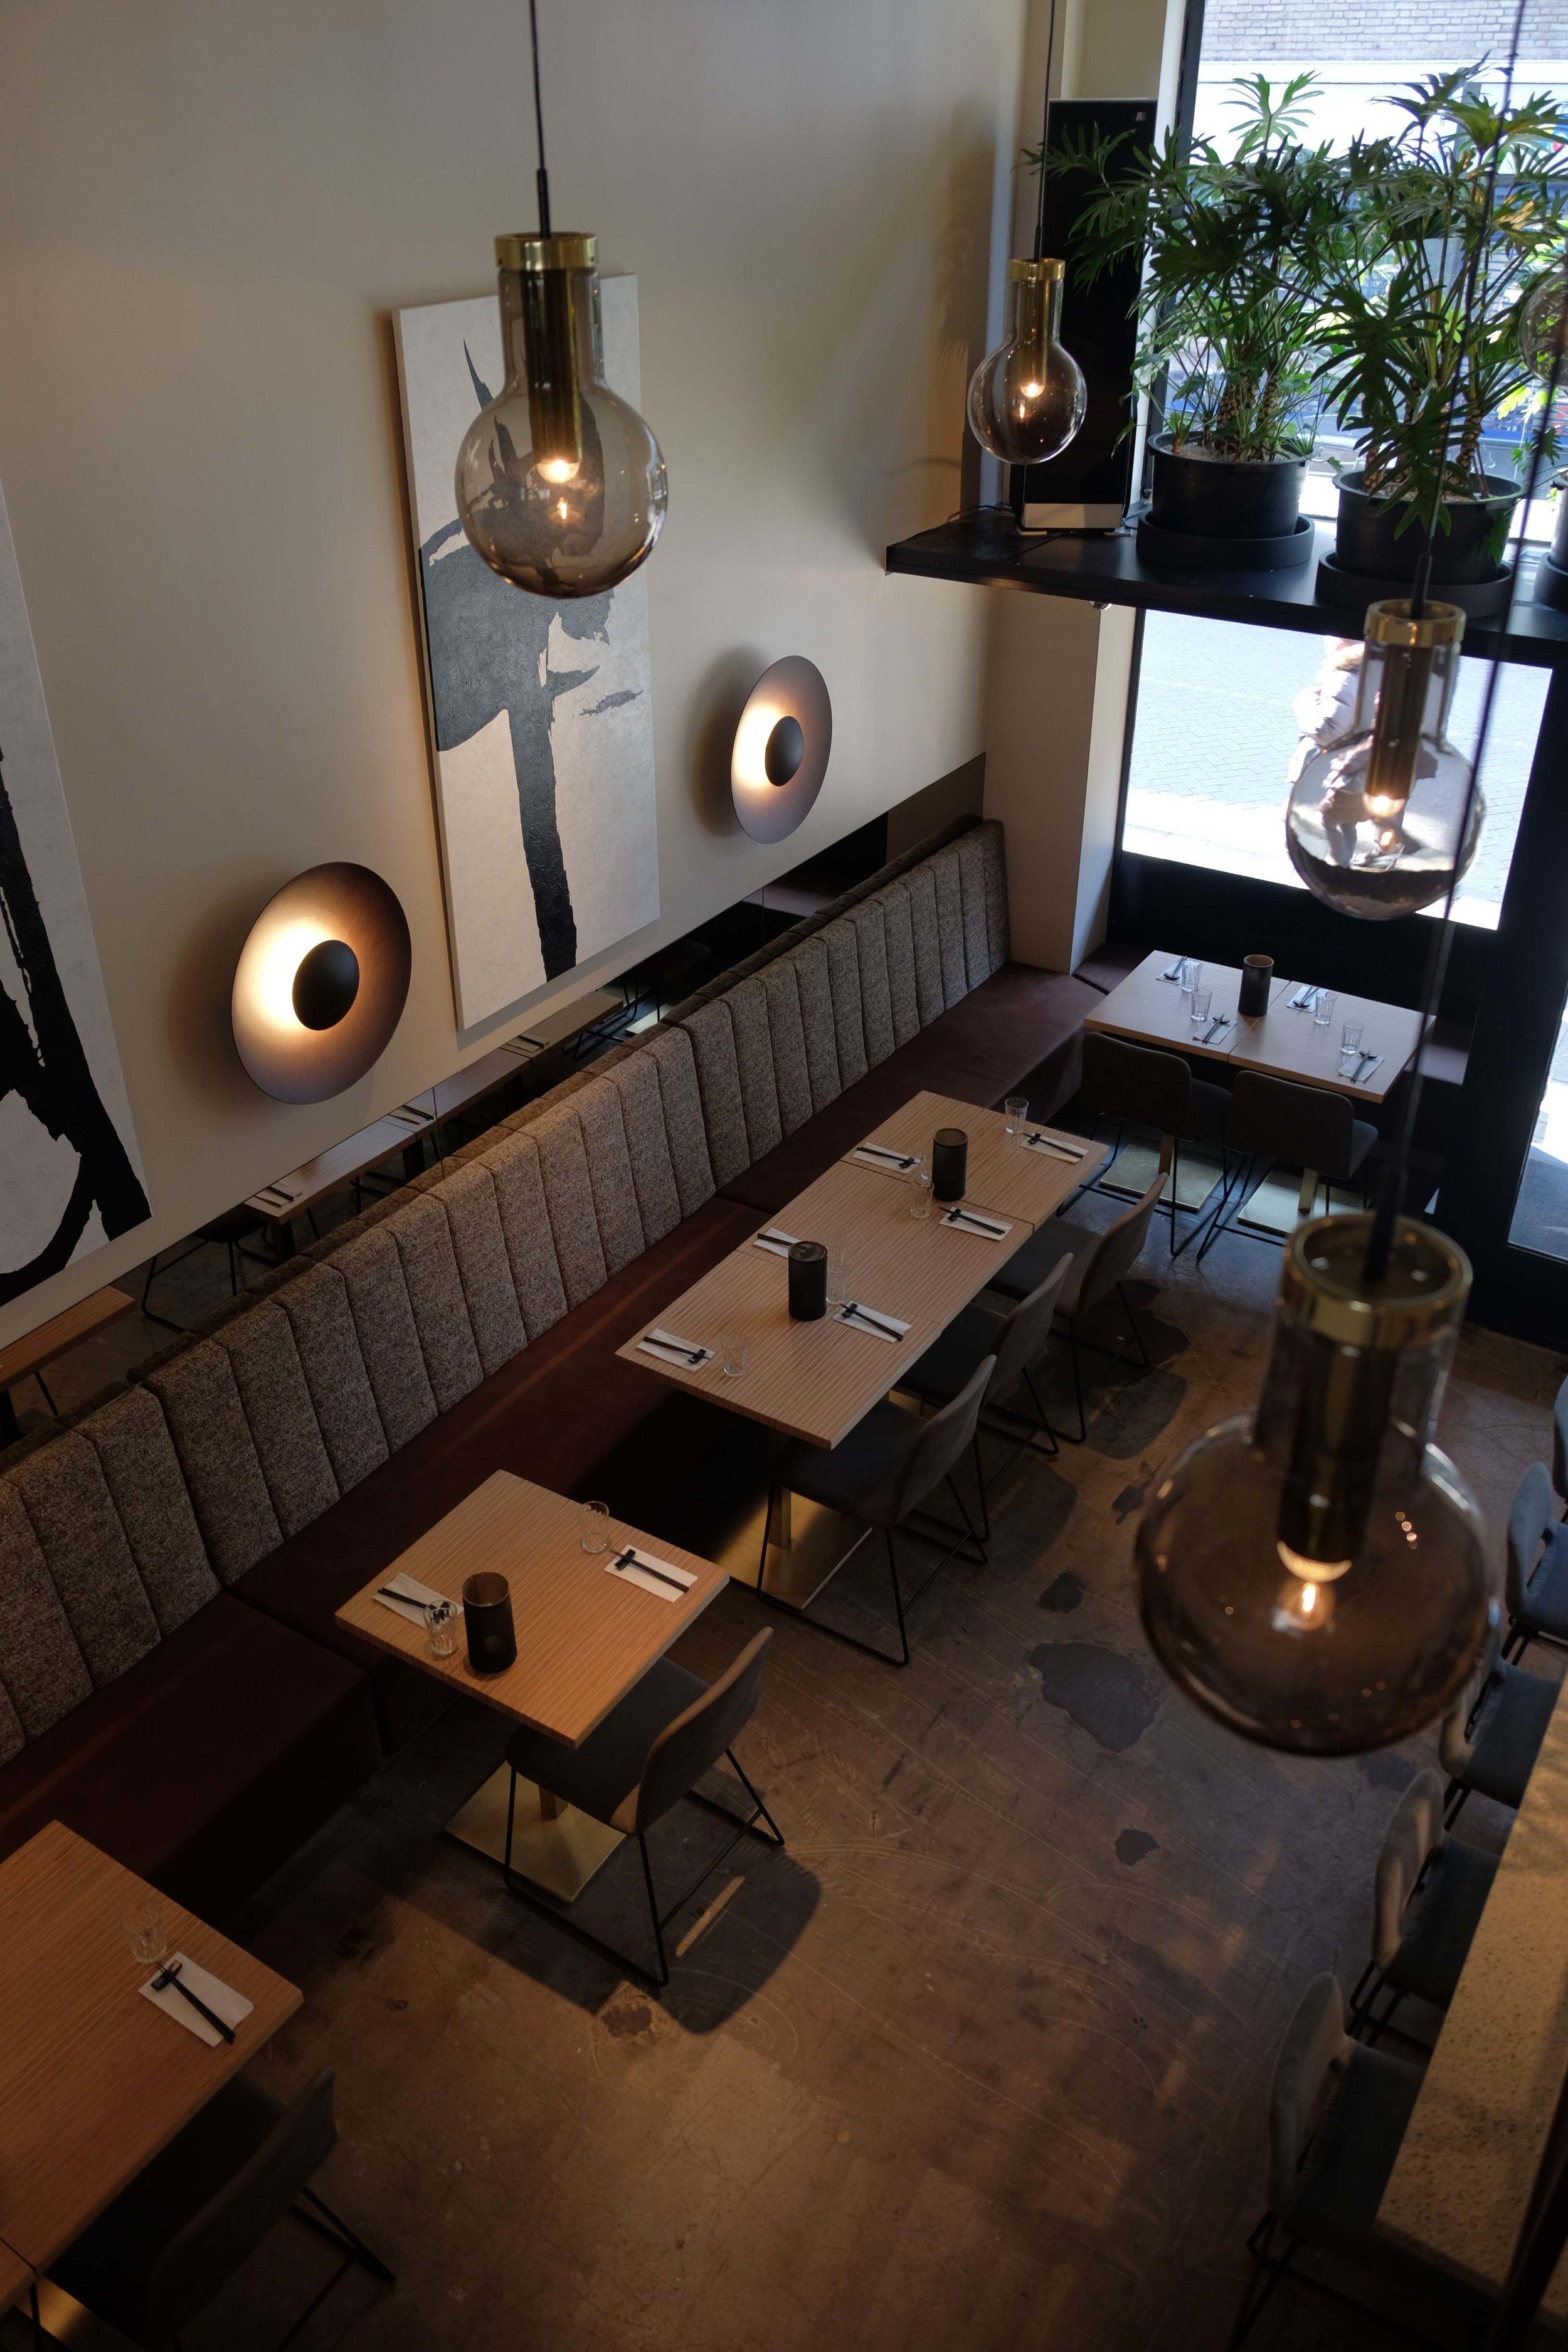 Restaurant Nooch Rotterdam westewagenstraat 56 lex de gooijer interiors 025.jpg